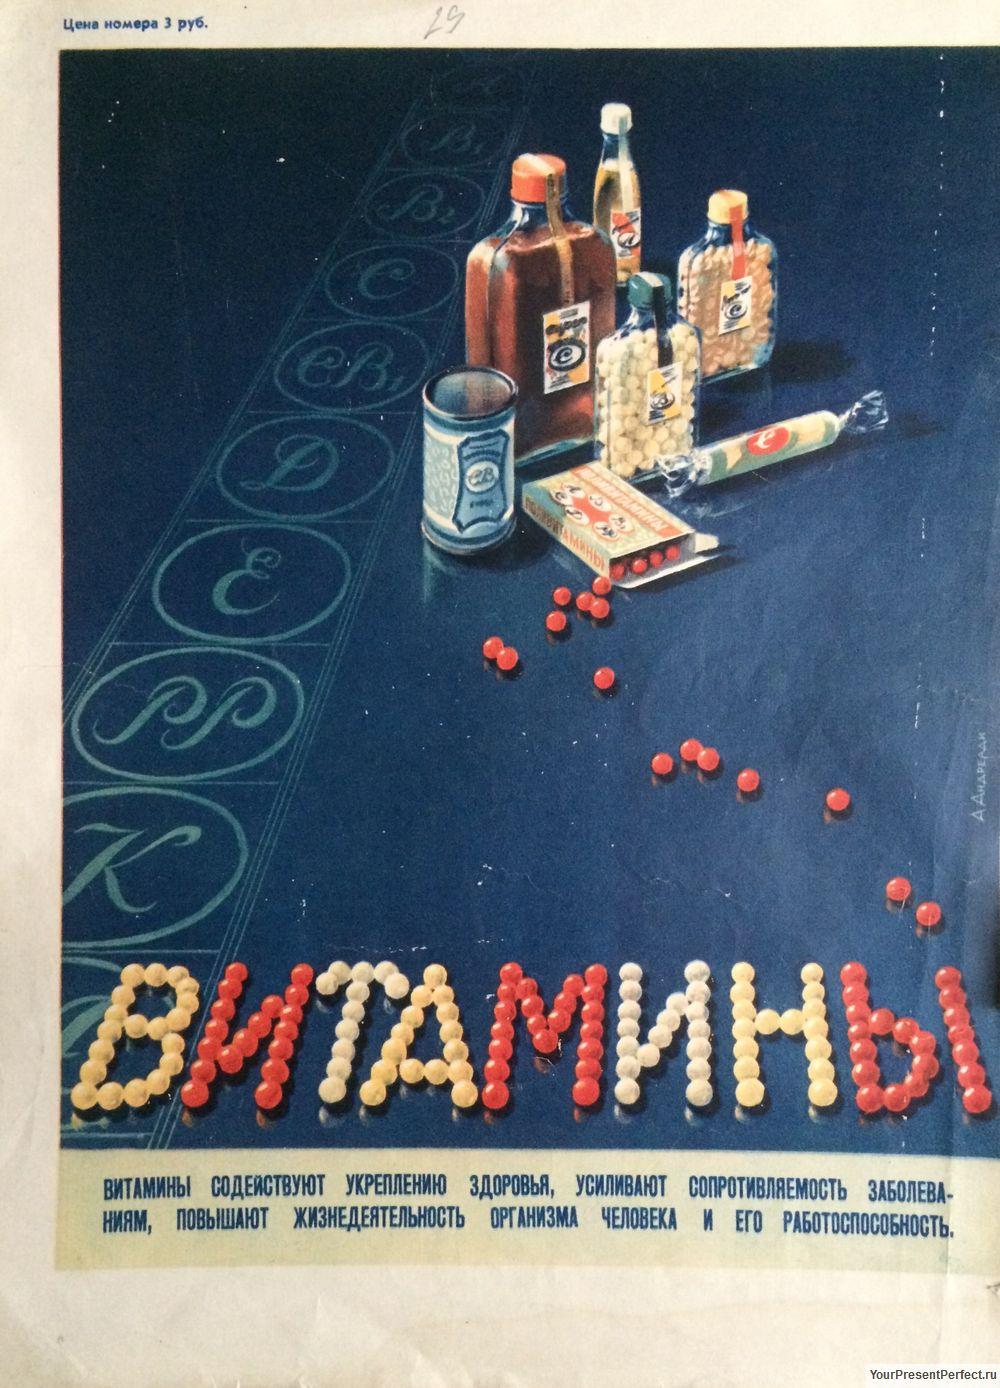 Журнал Огонек 1960. Реклама. Витамины.